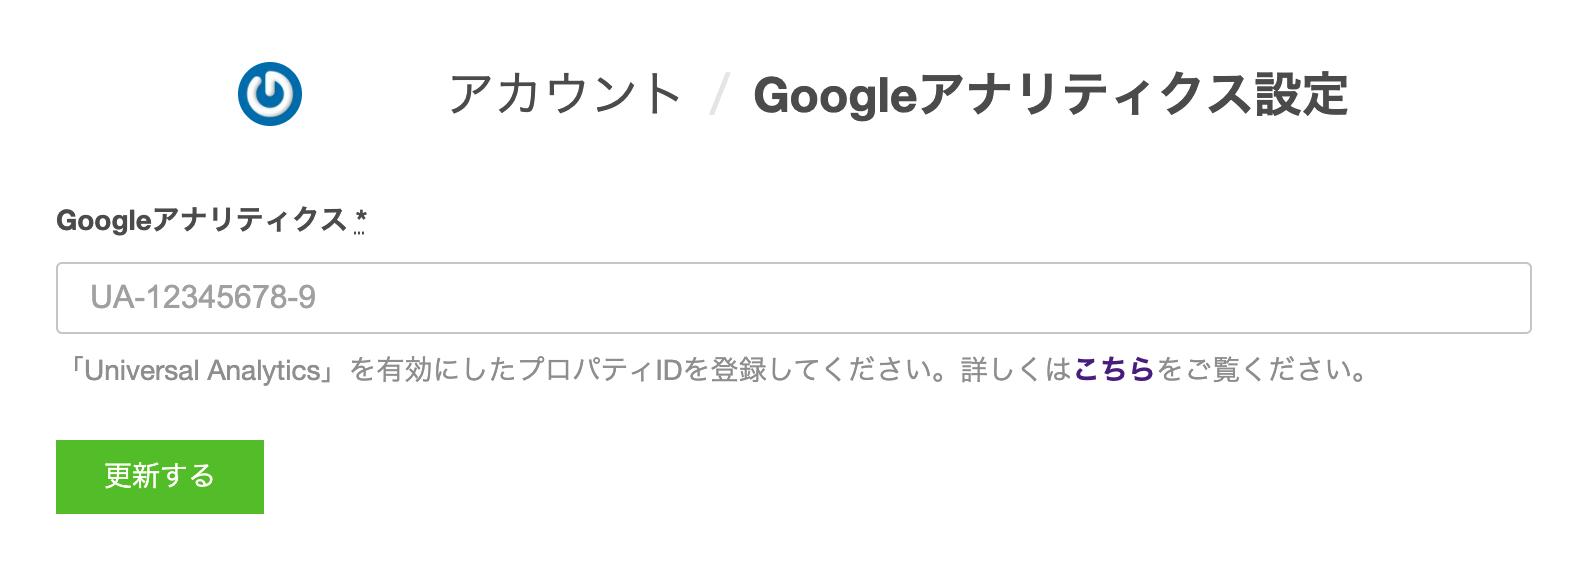 QiitaでのGoogleアナリティクスの設定画面